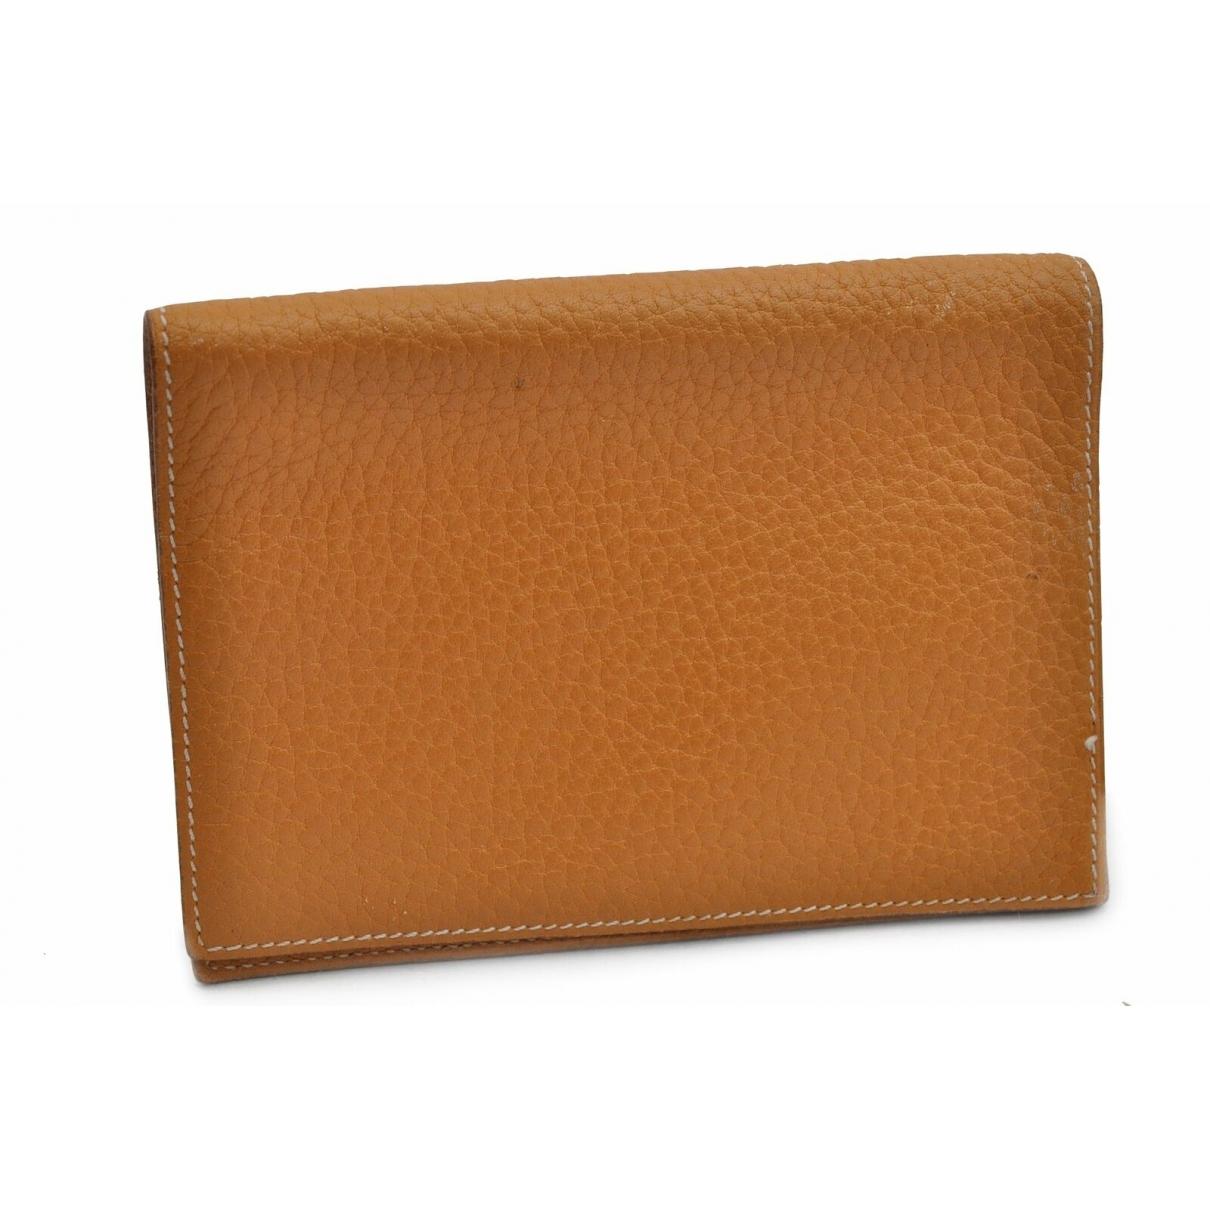 Hermès \N Beige Leather Purses, wallet & cases for Women \N